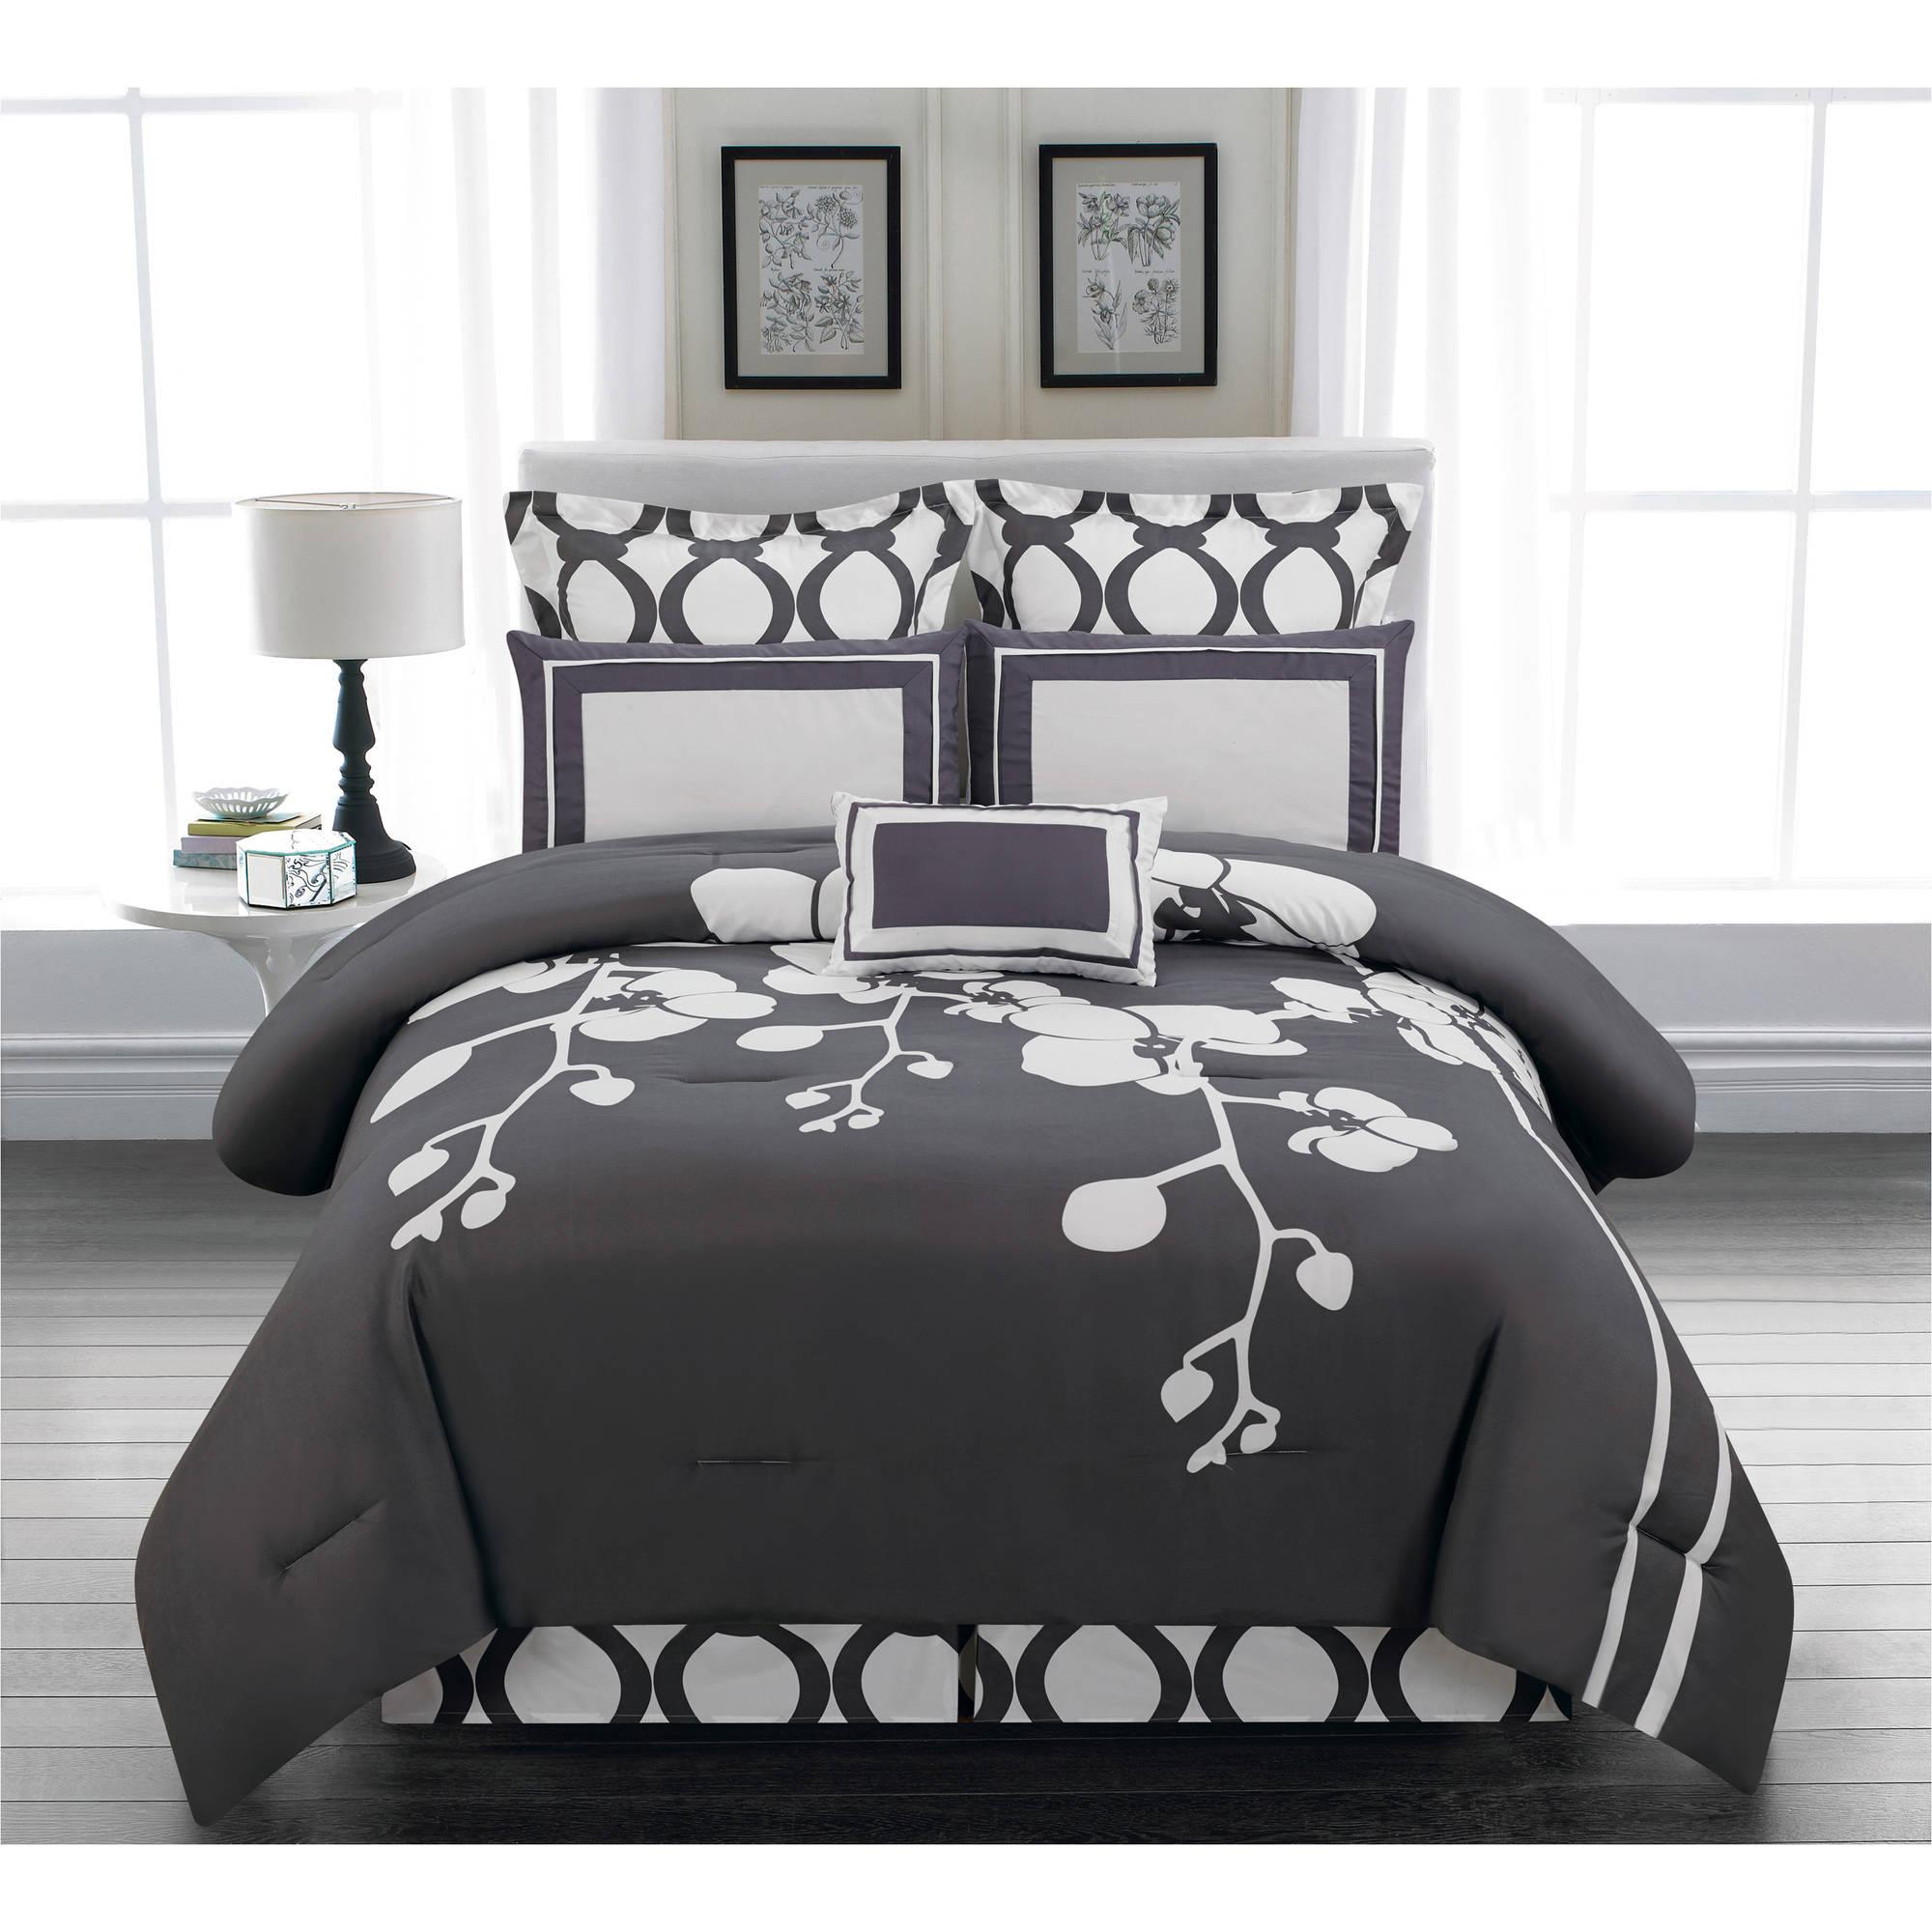 Duck River Textiles Ashlea 10-Piece Oversize Overfilled Queen Comforter Set